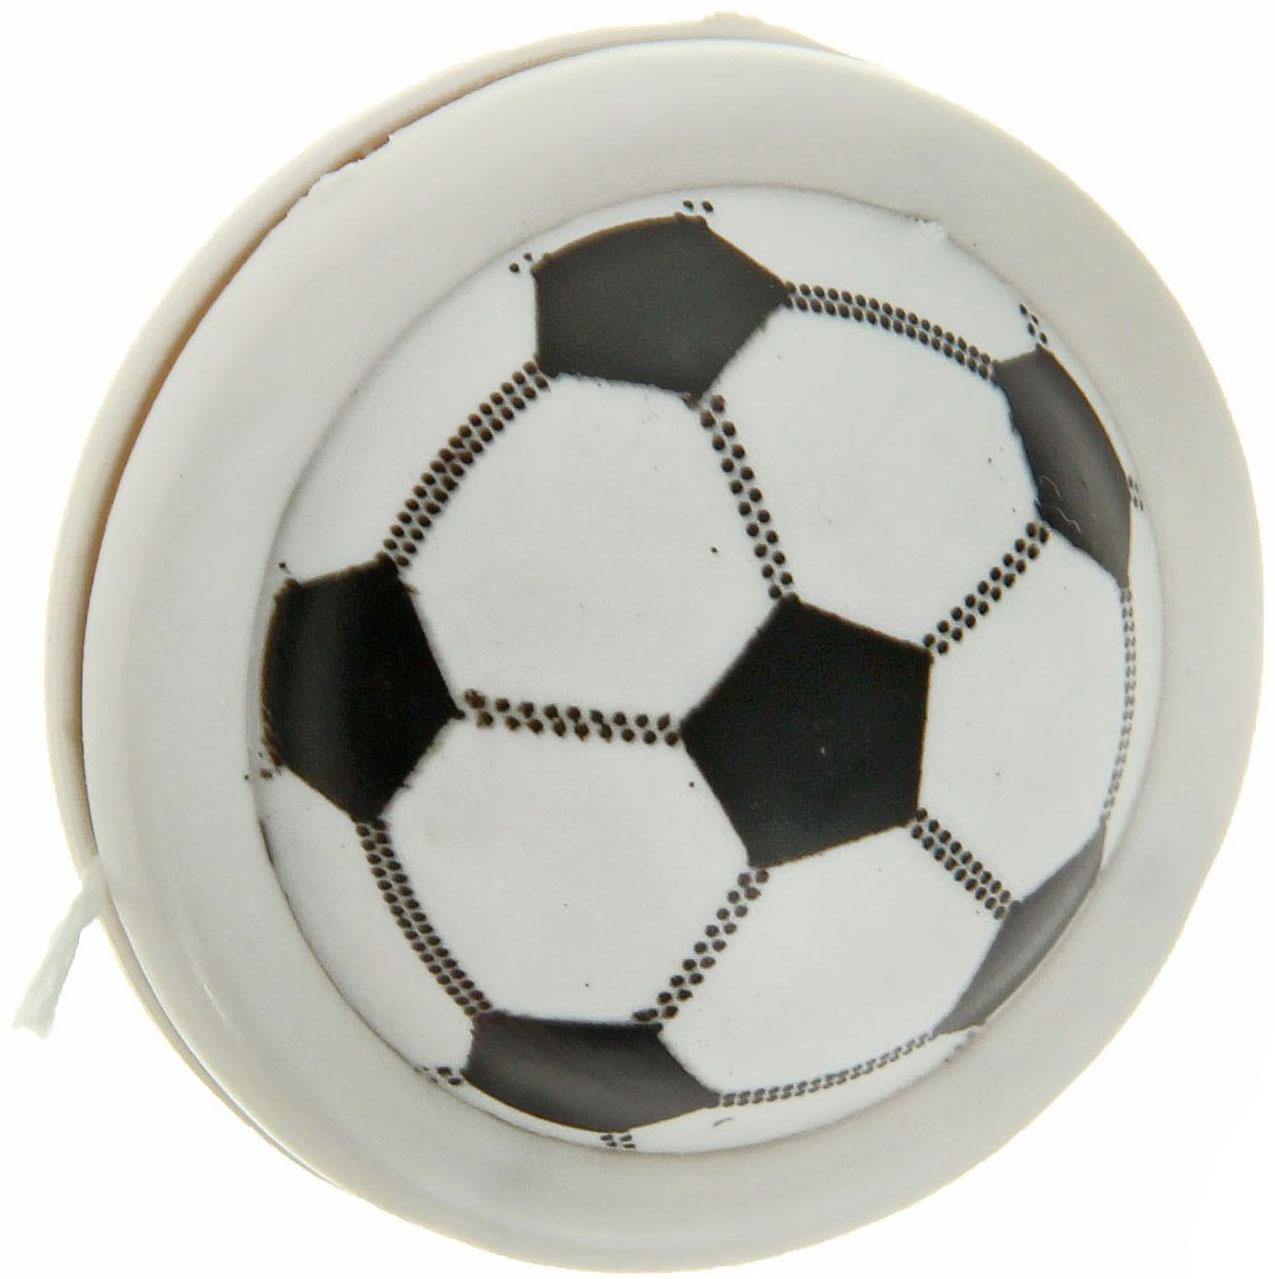 Sima-land Йо-йо Футбол 305872